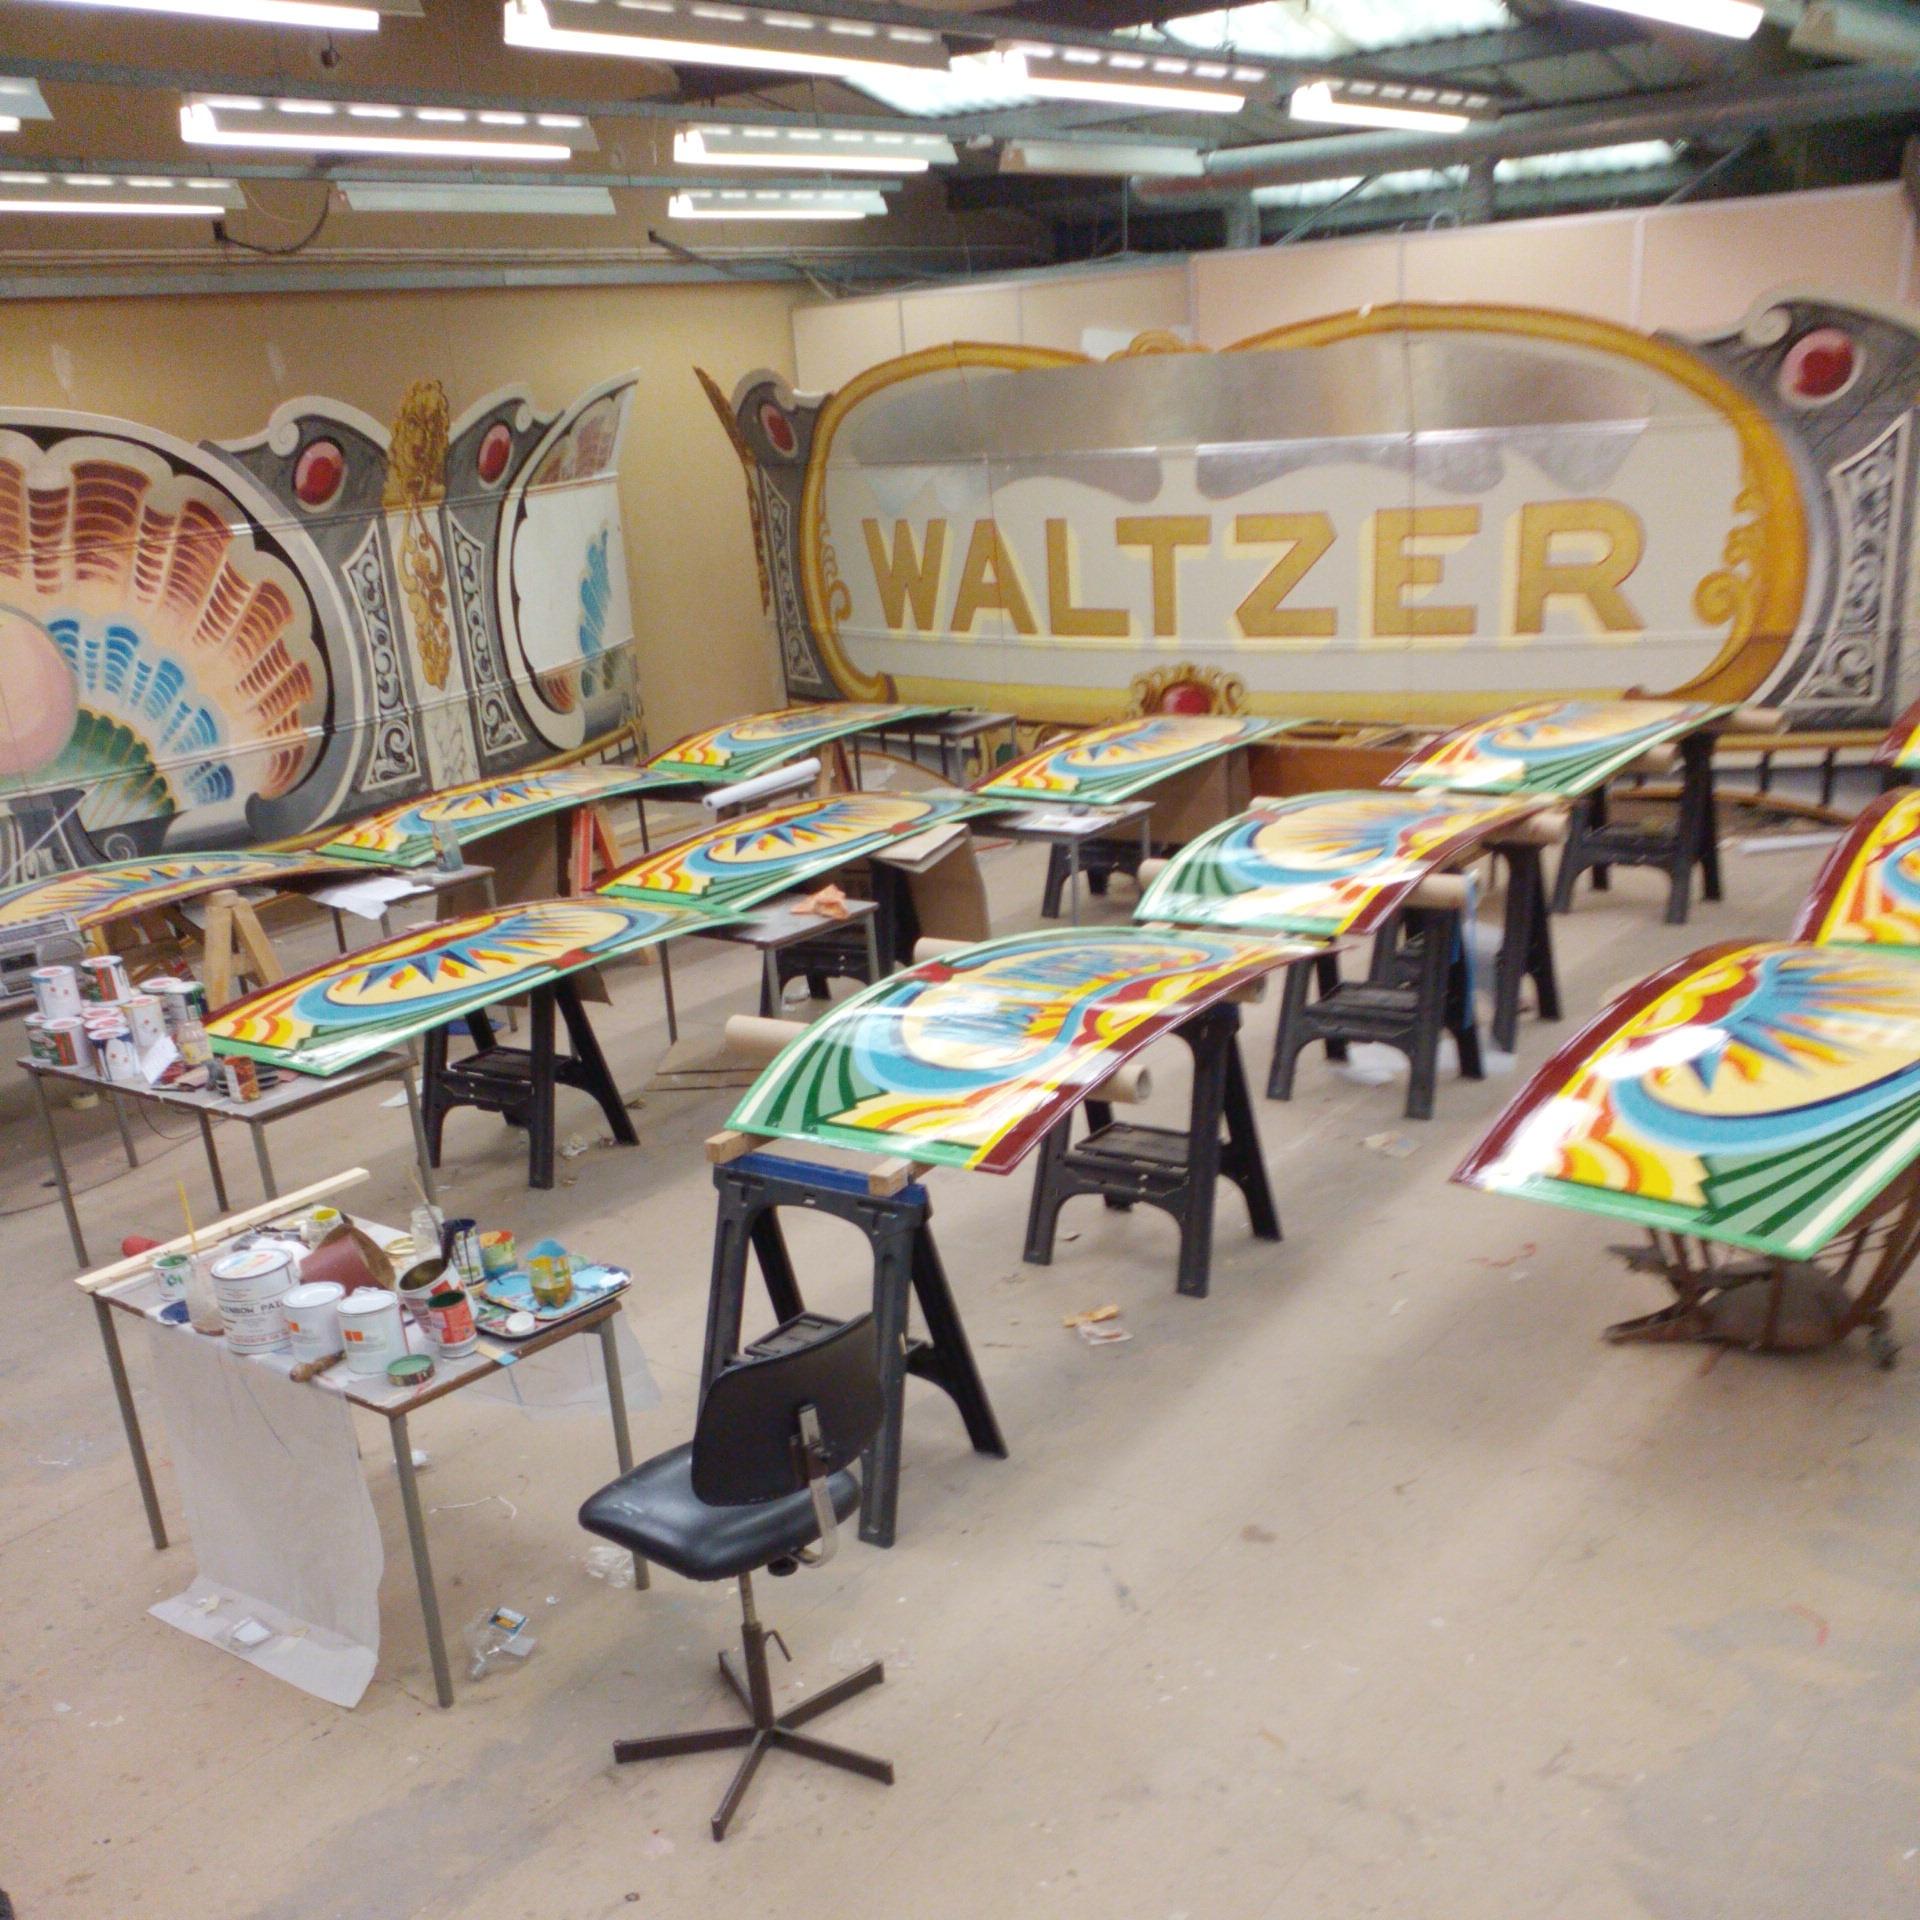 Painting a Fairground Waltzer -KBmorgan